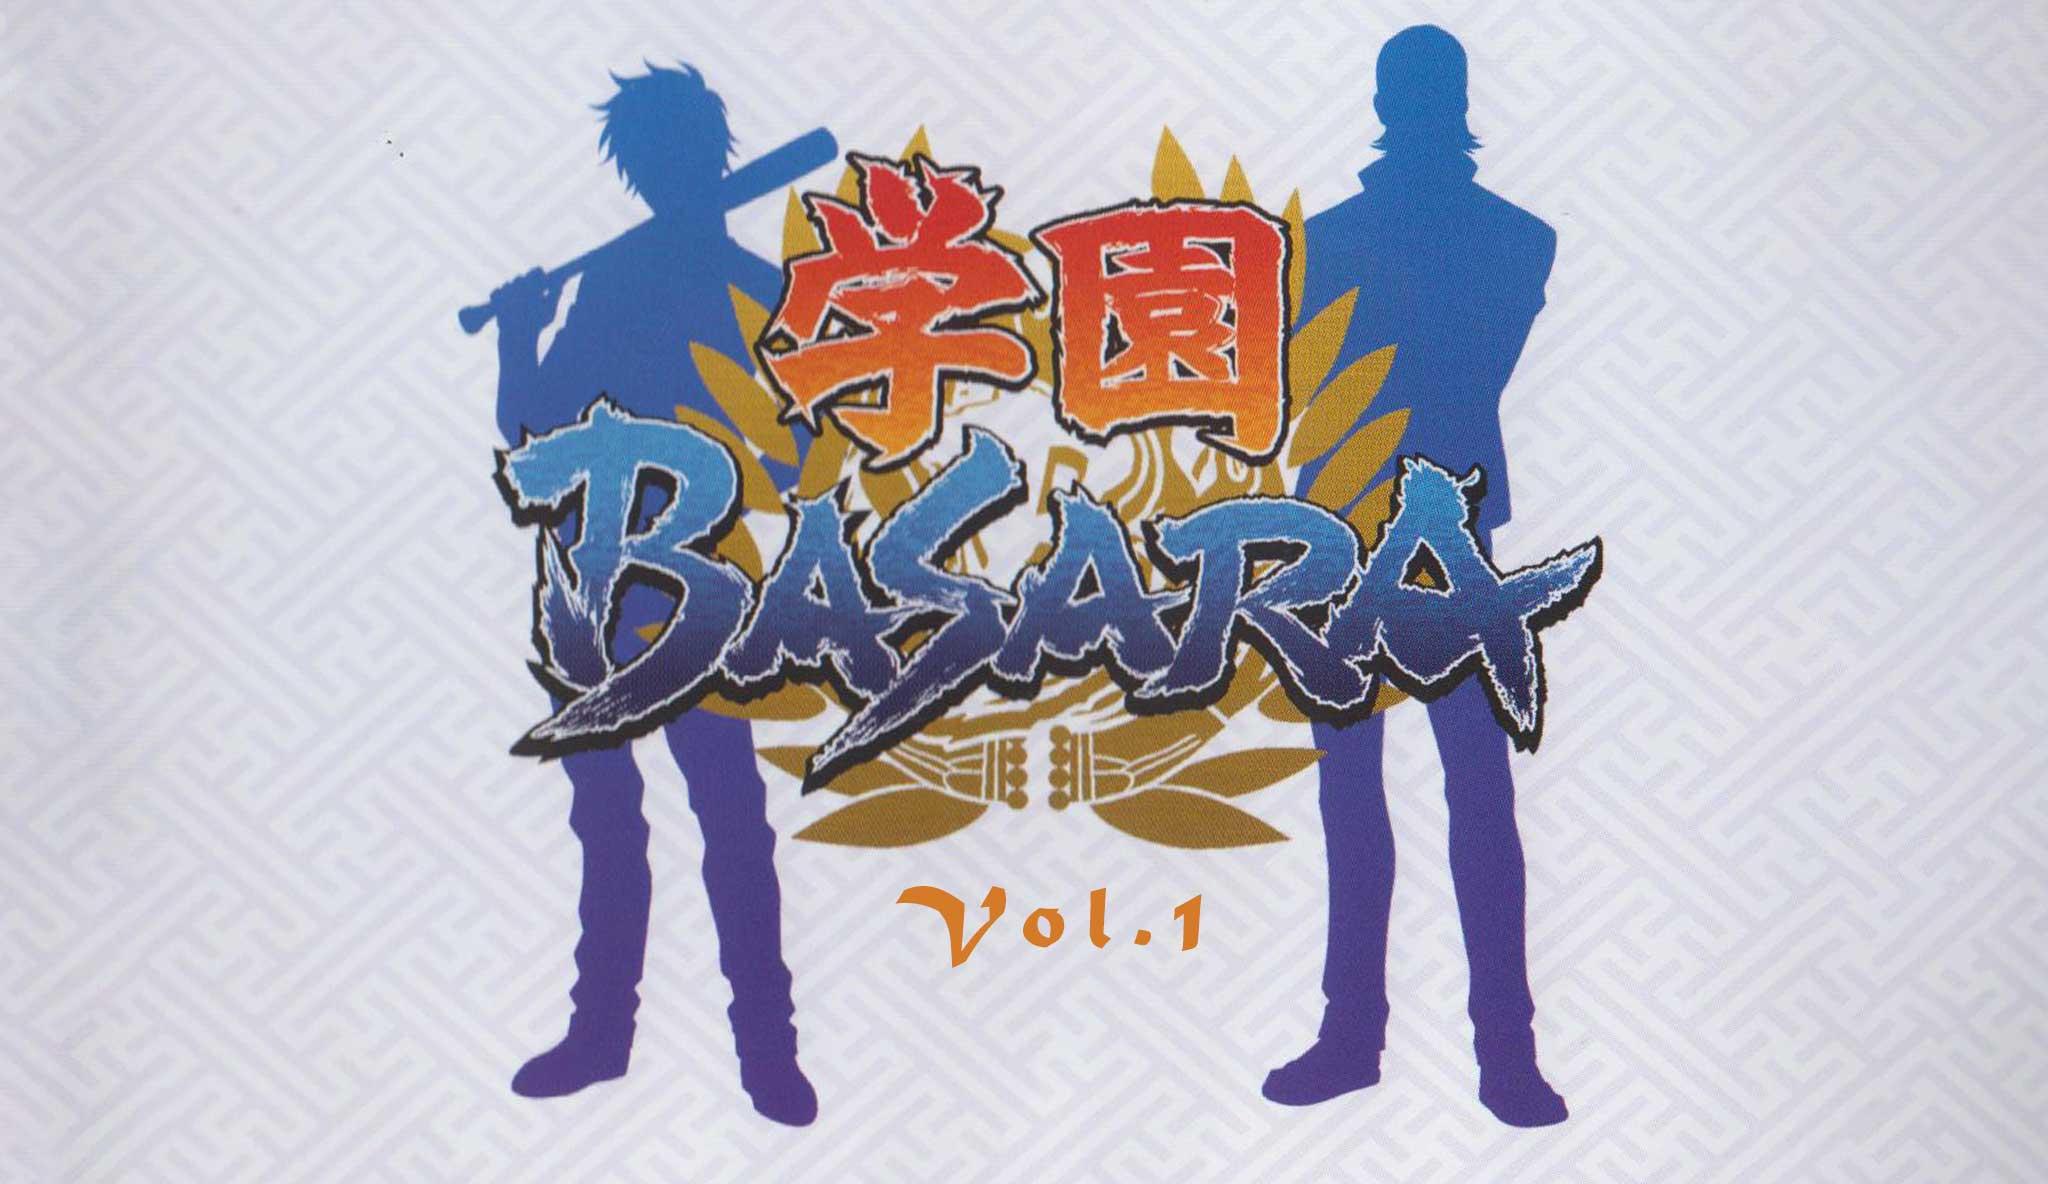 gakuen-basara-samurai-highschool-vol-1-episode-1-4\header.jpg